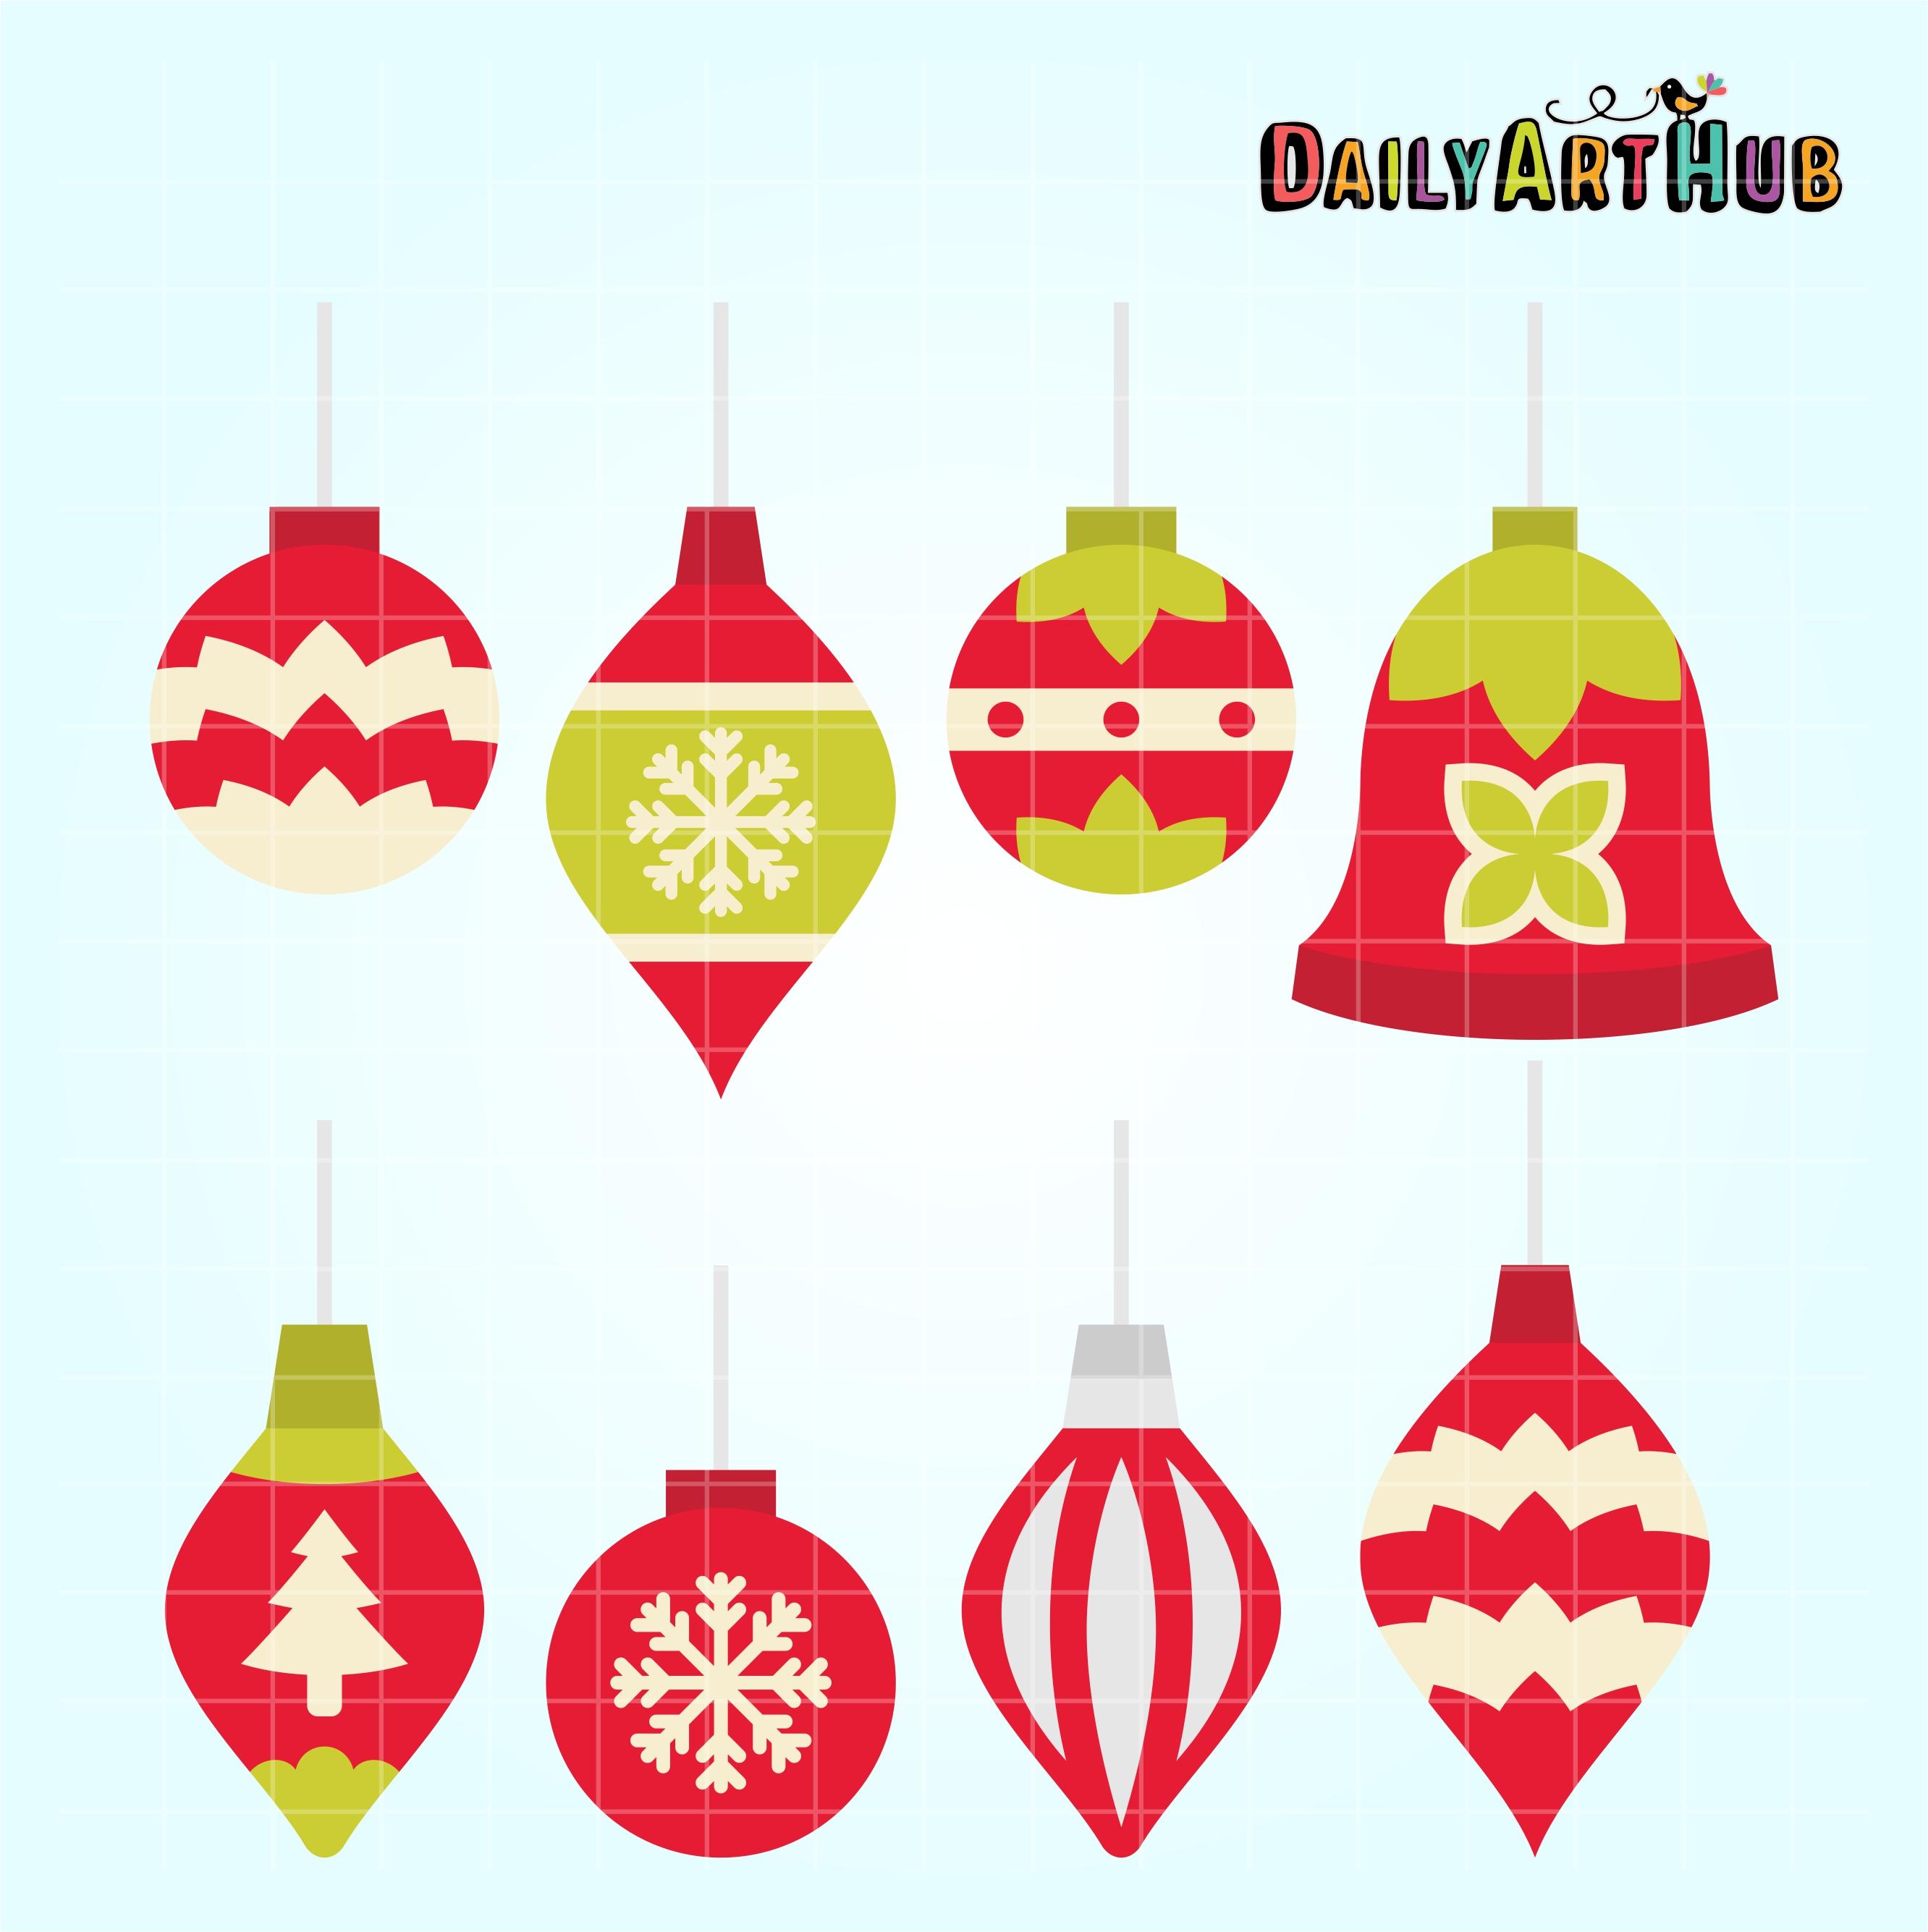 Simple Christmas Ornaments Clip Art Set | Daily Art Hub